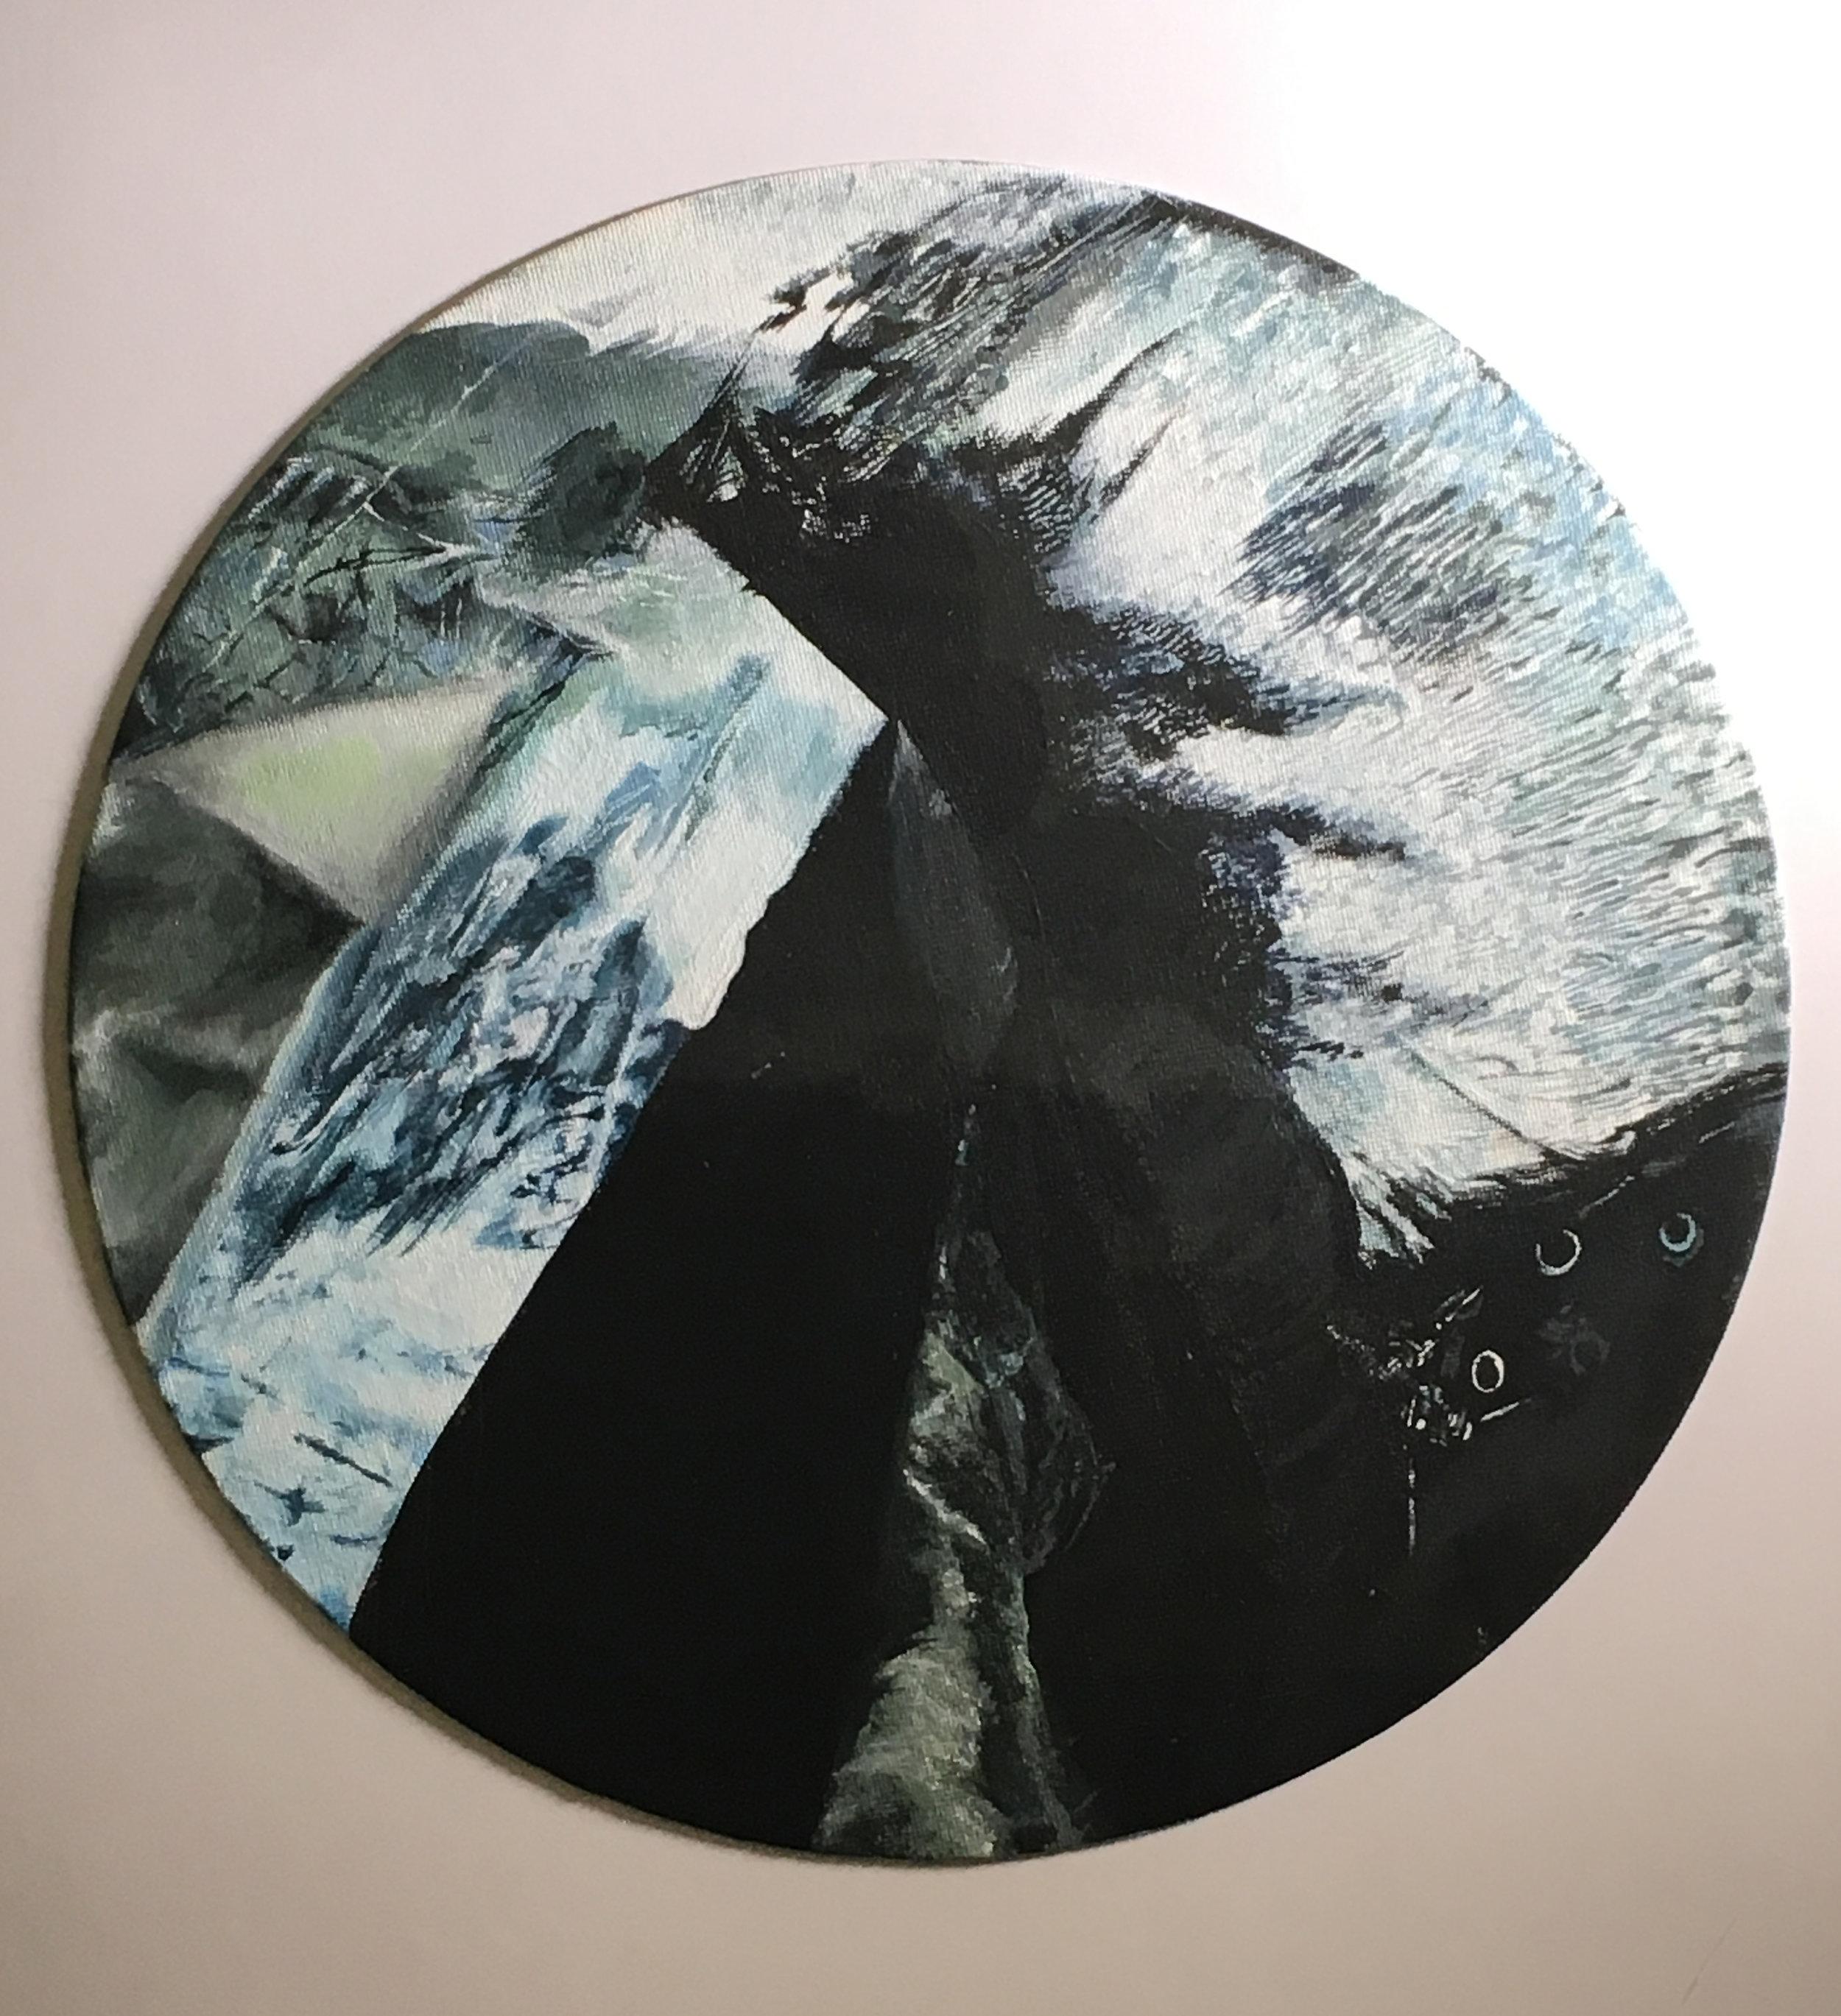 Giselle Echeveria  Untitled Acrylic on Canvas  High Tech 17x17  Hudson County